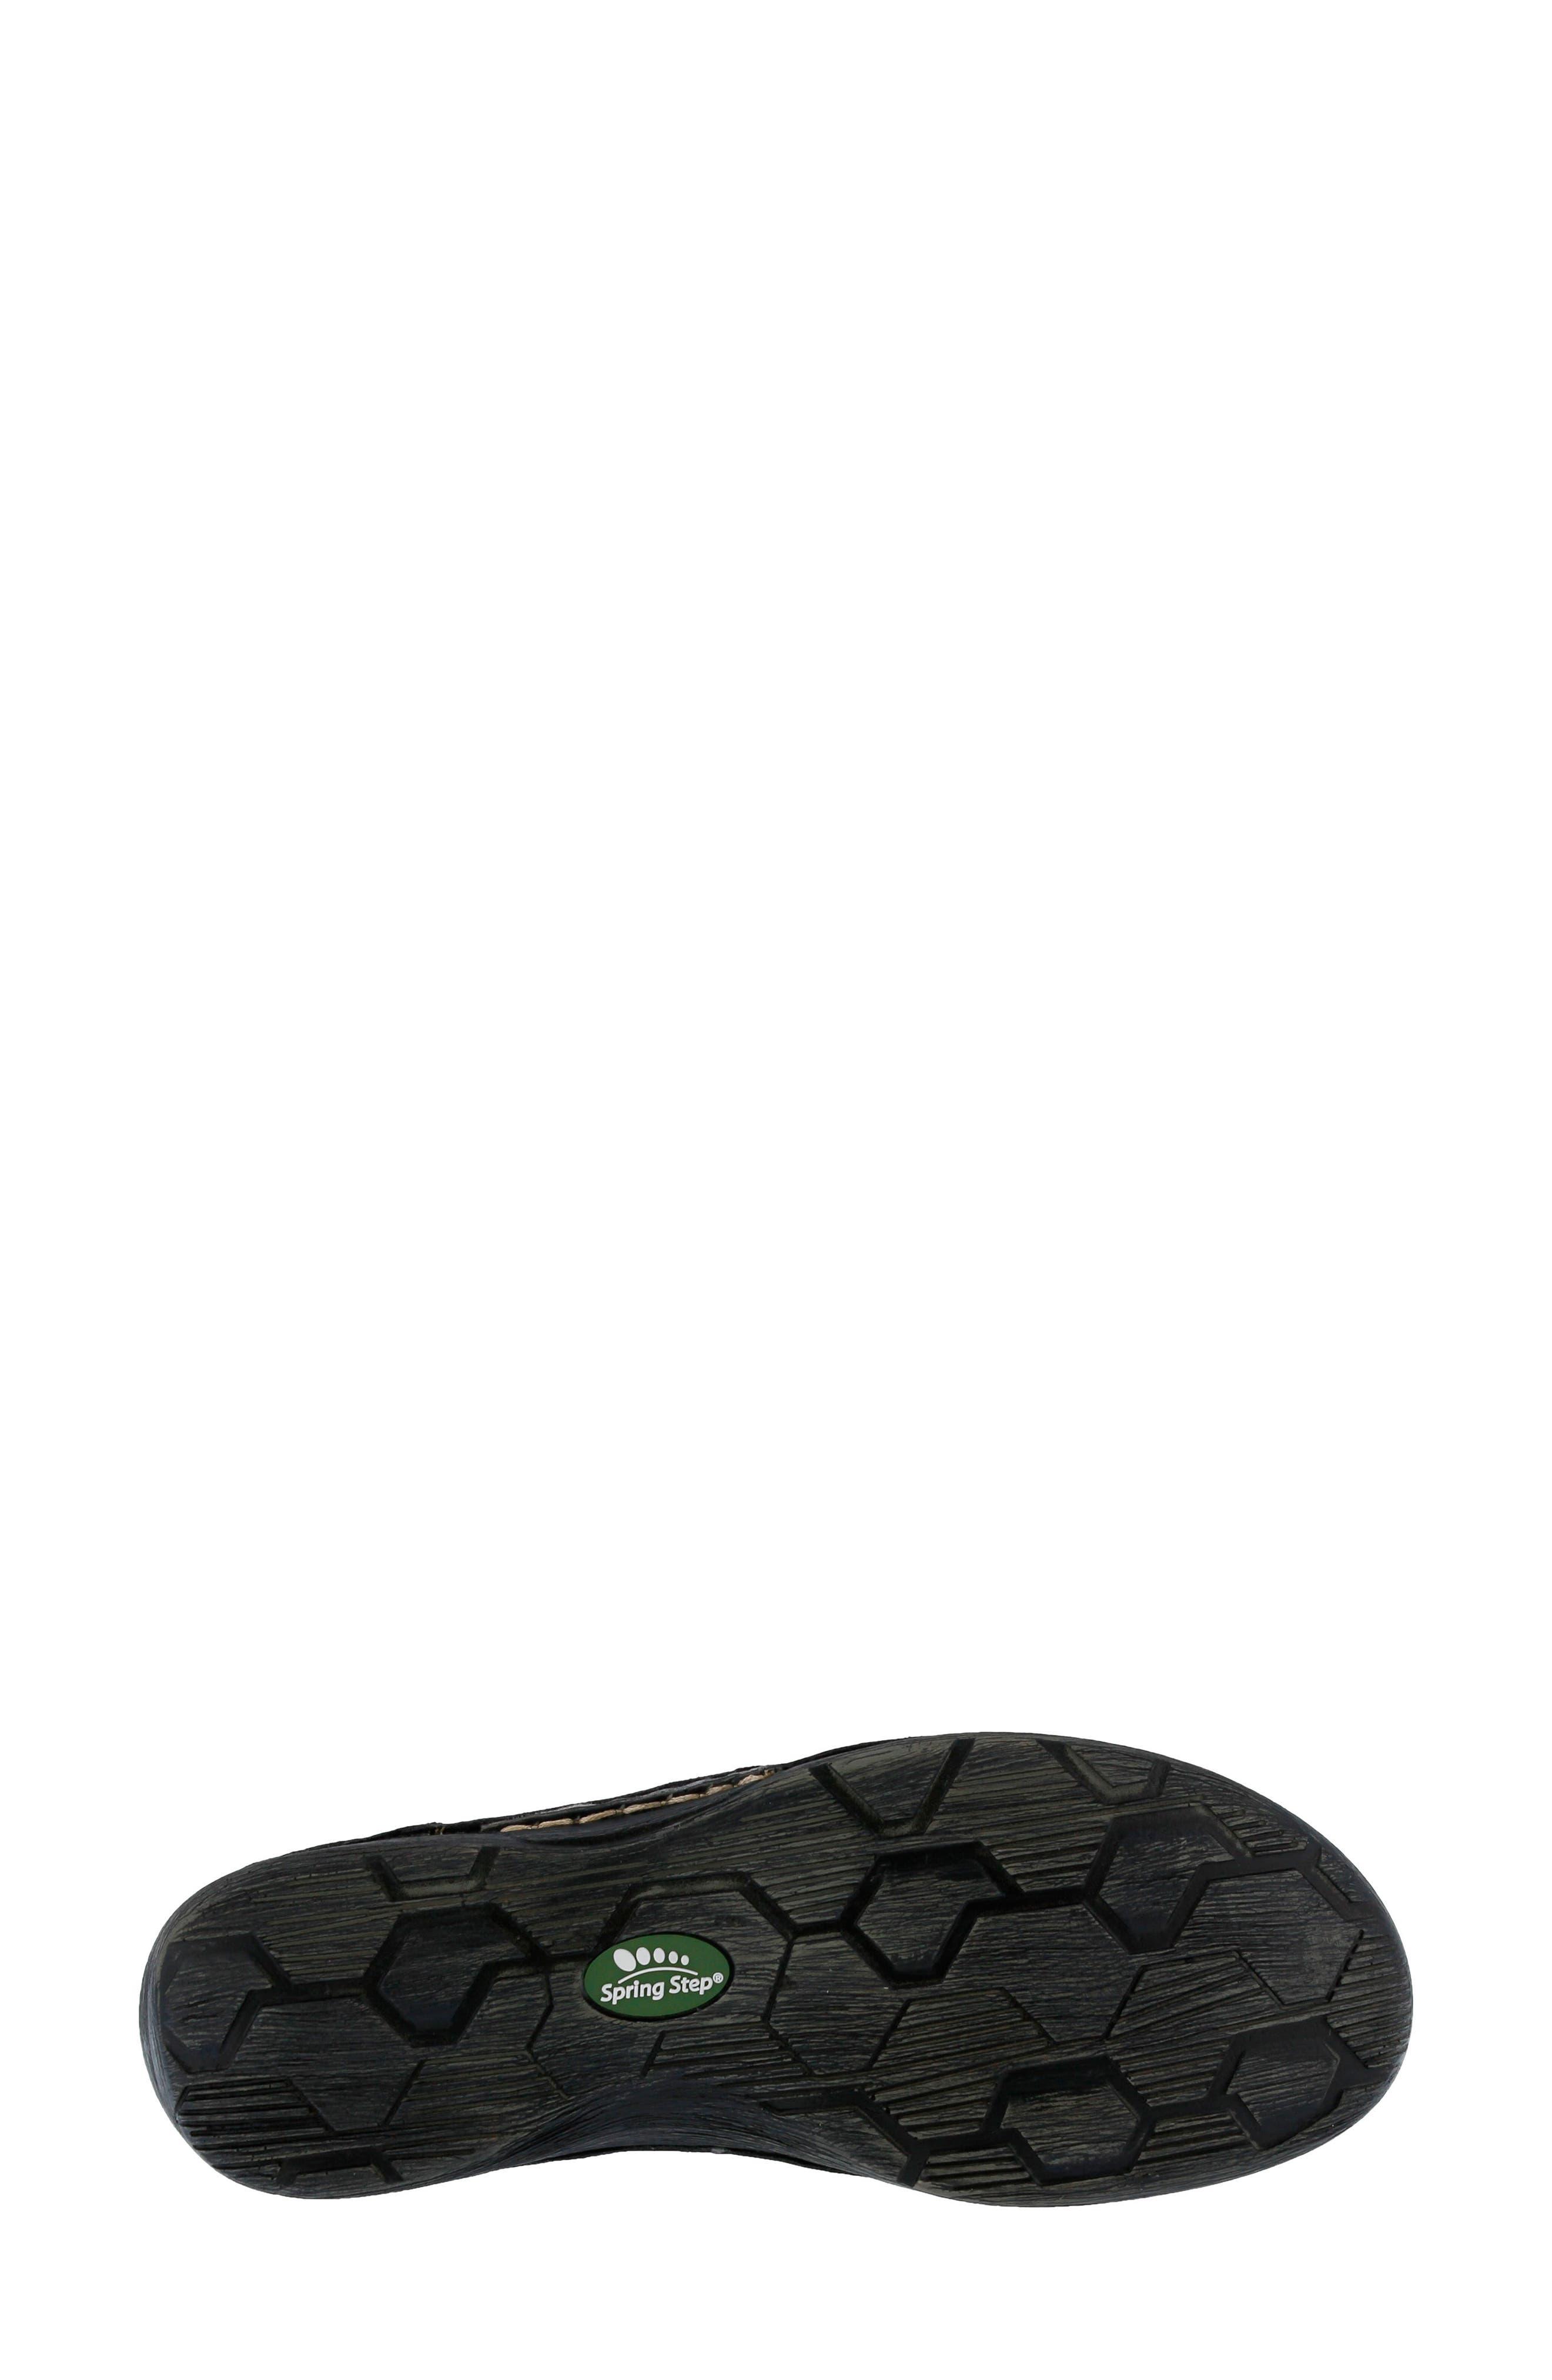 Carhop Sneaker,                             Alternate thumbnail 5, color,                             BLACK LEATHER